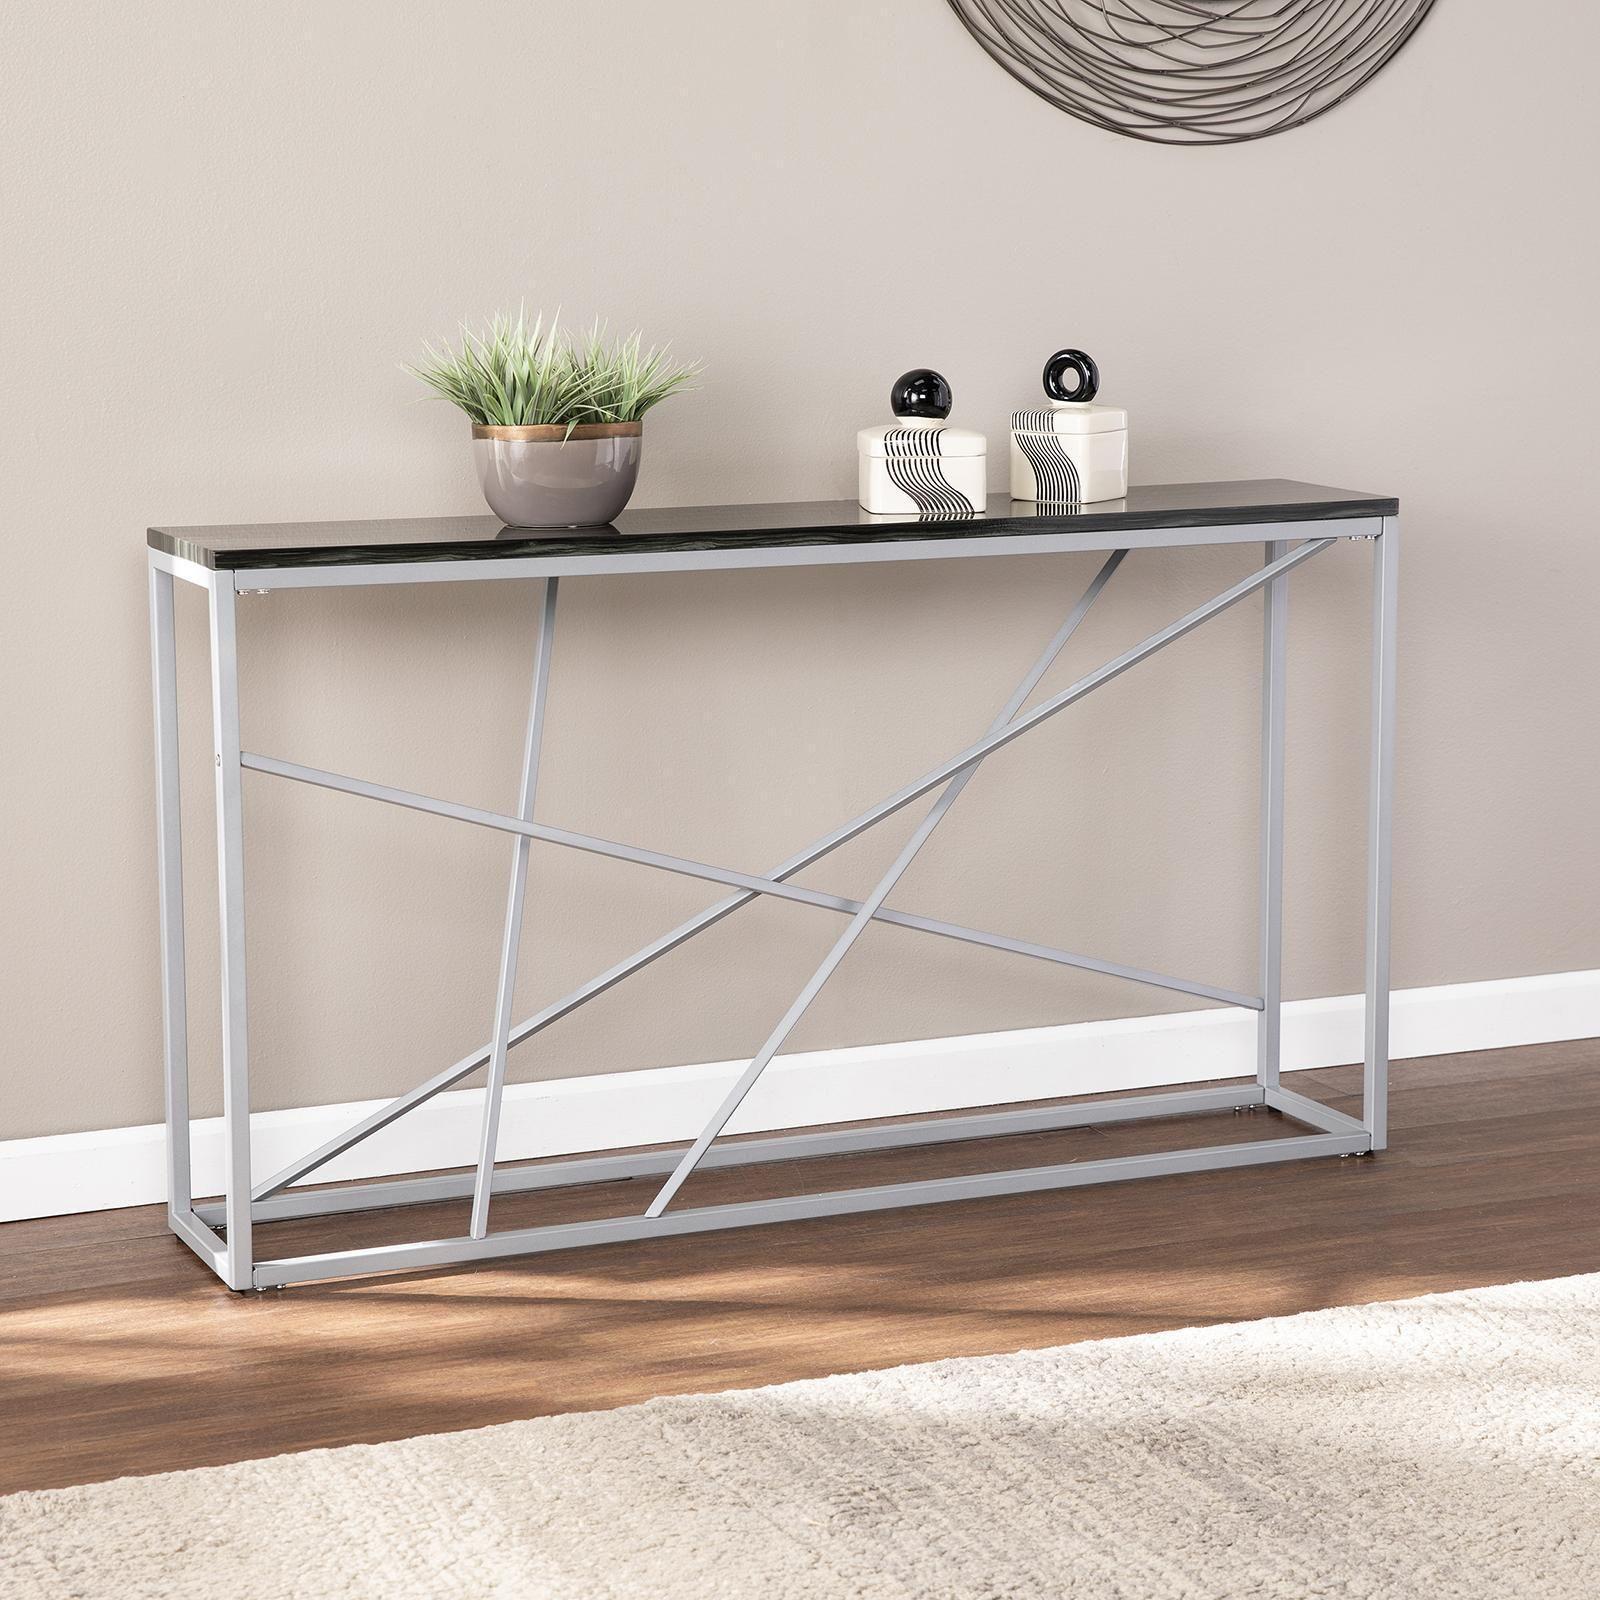 Studio 76 Arendal Faux Stone Console Table Silver In 2020 Skinny Console Table Console Table Dining Room Console [ 1600 x 1600 Pixel ]